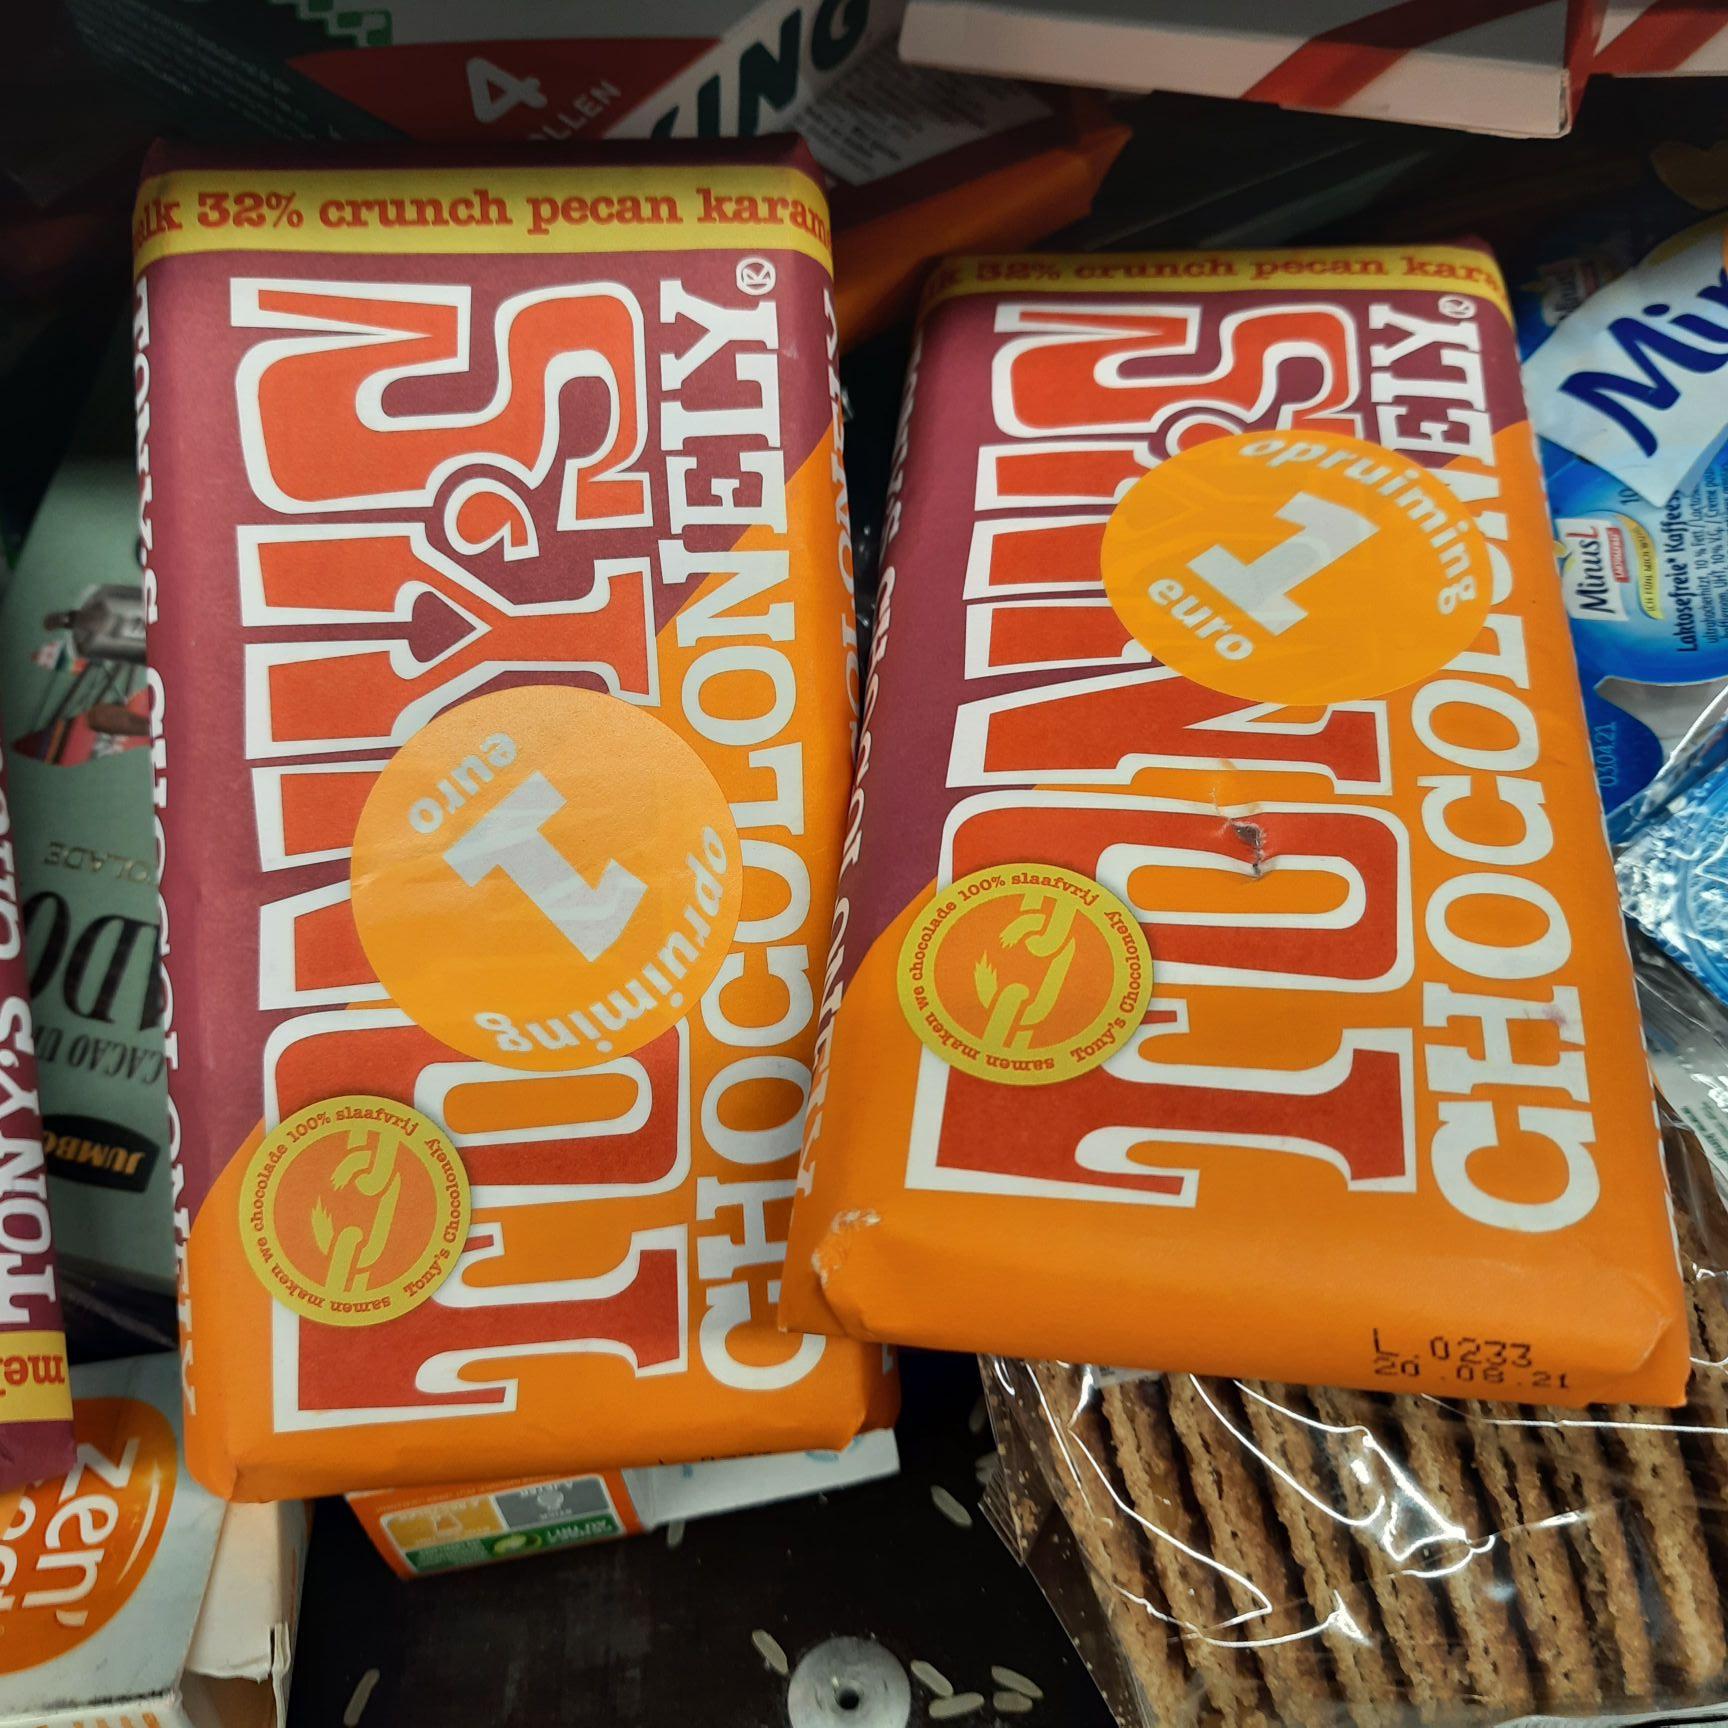 [Lokaal?] Tony's Chocolonely estafettereep Melk Crunch Pecan